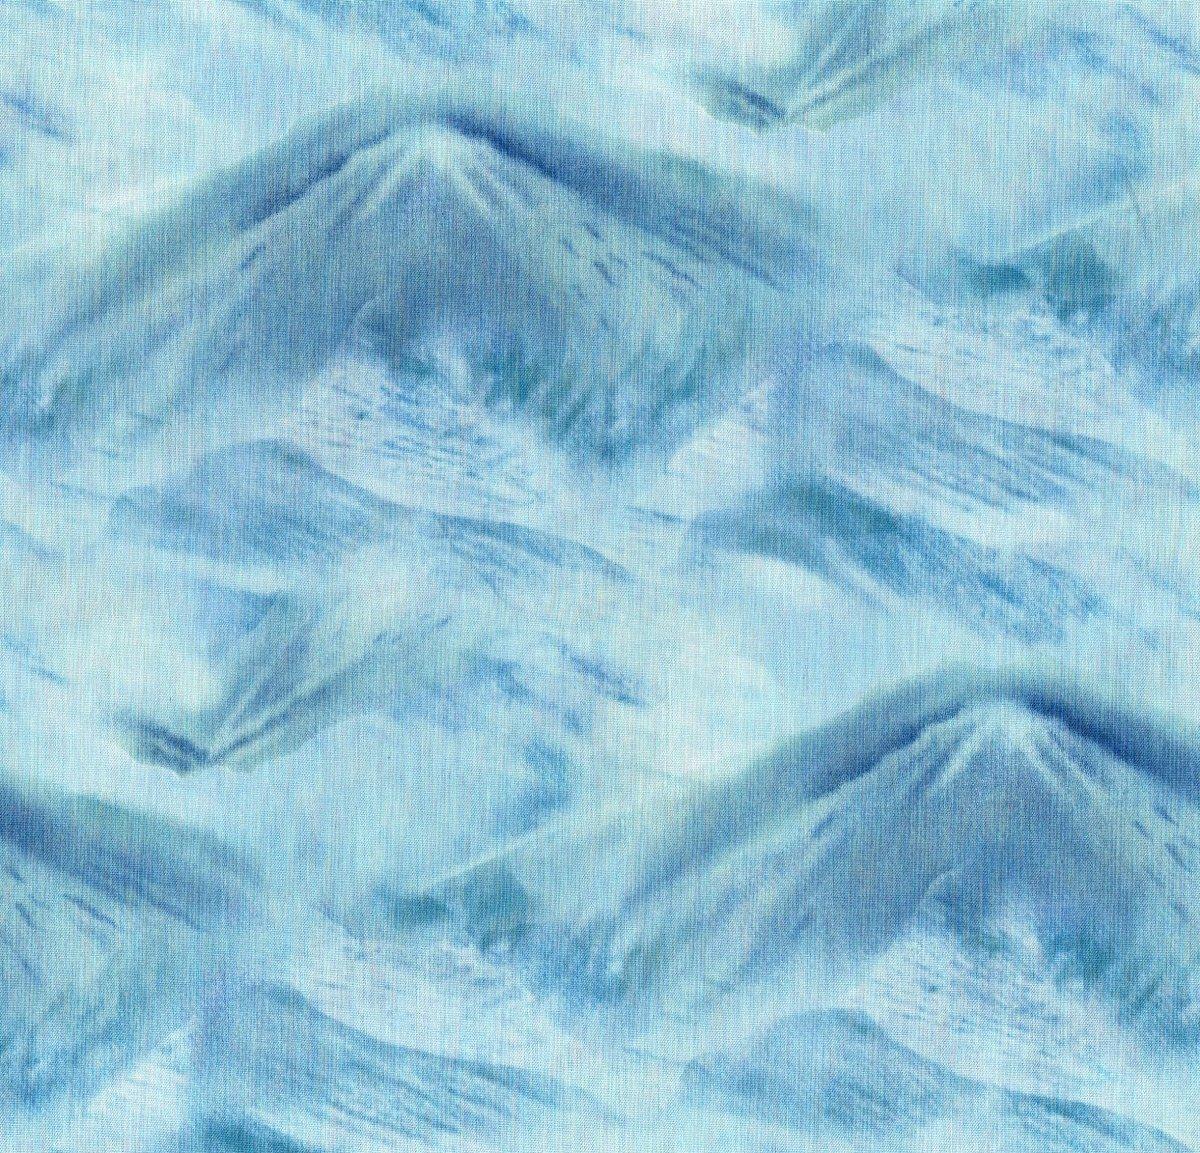 Glaciers  Backer PN020 4.5 Yards